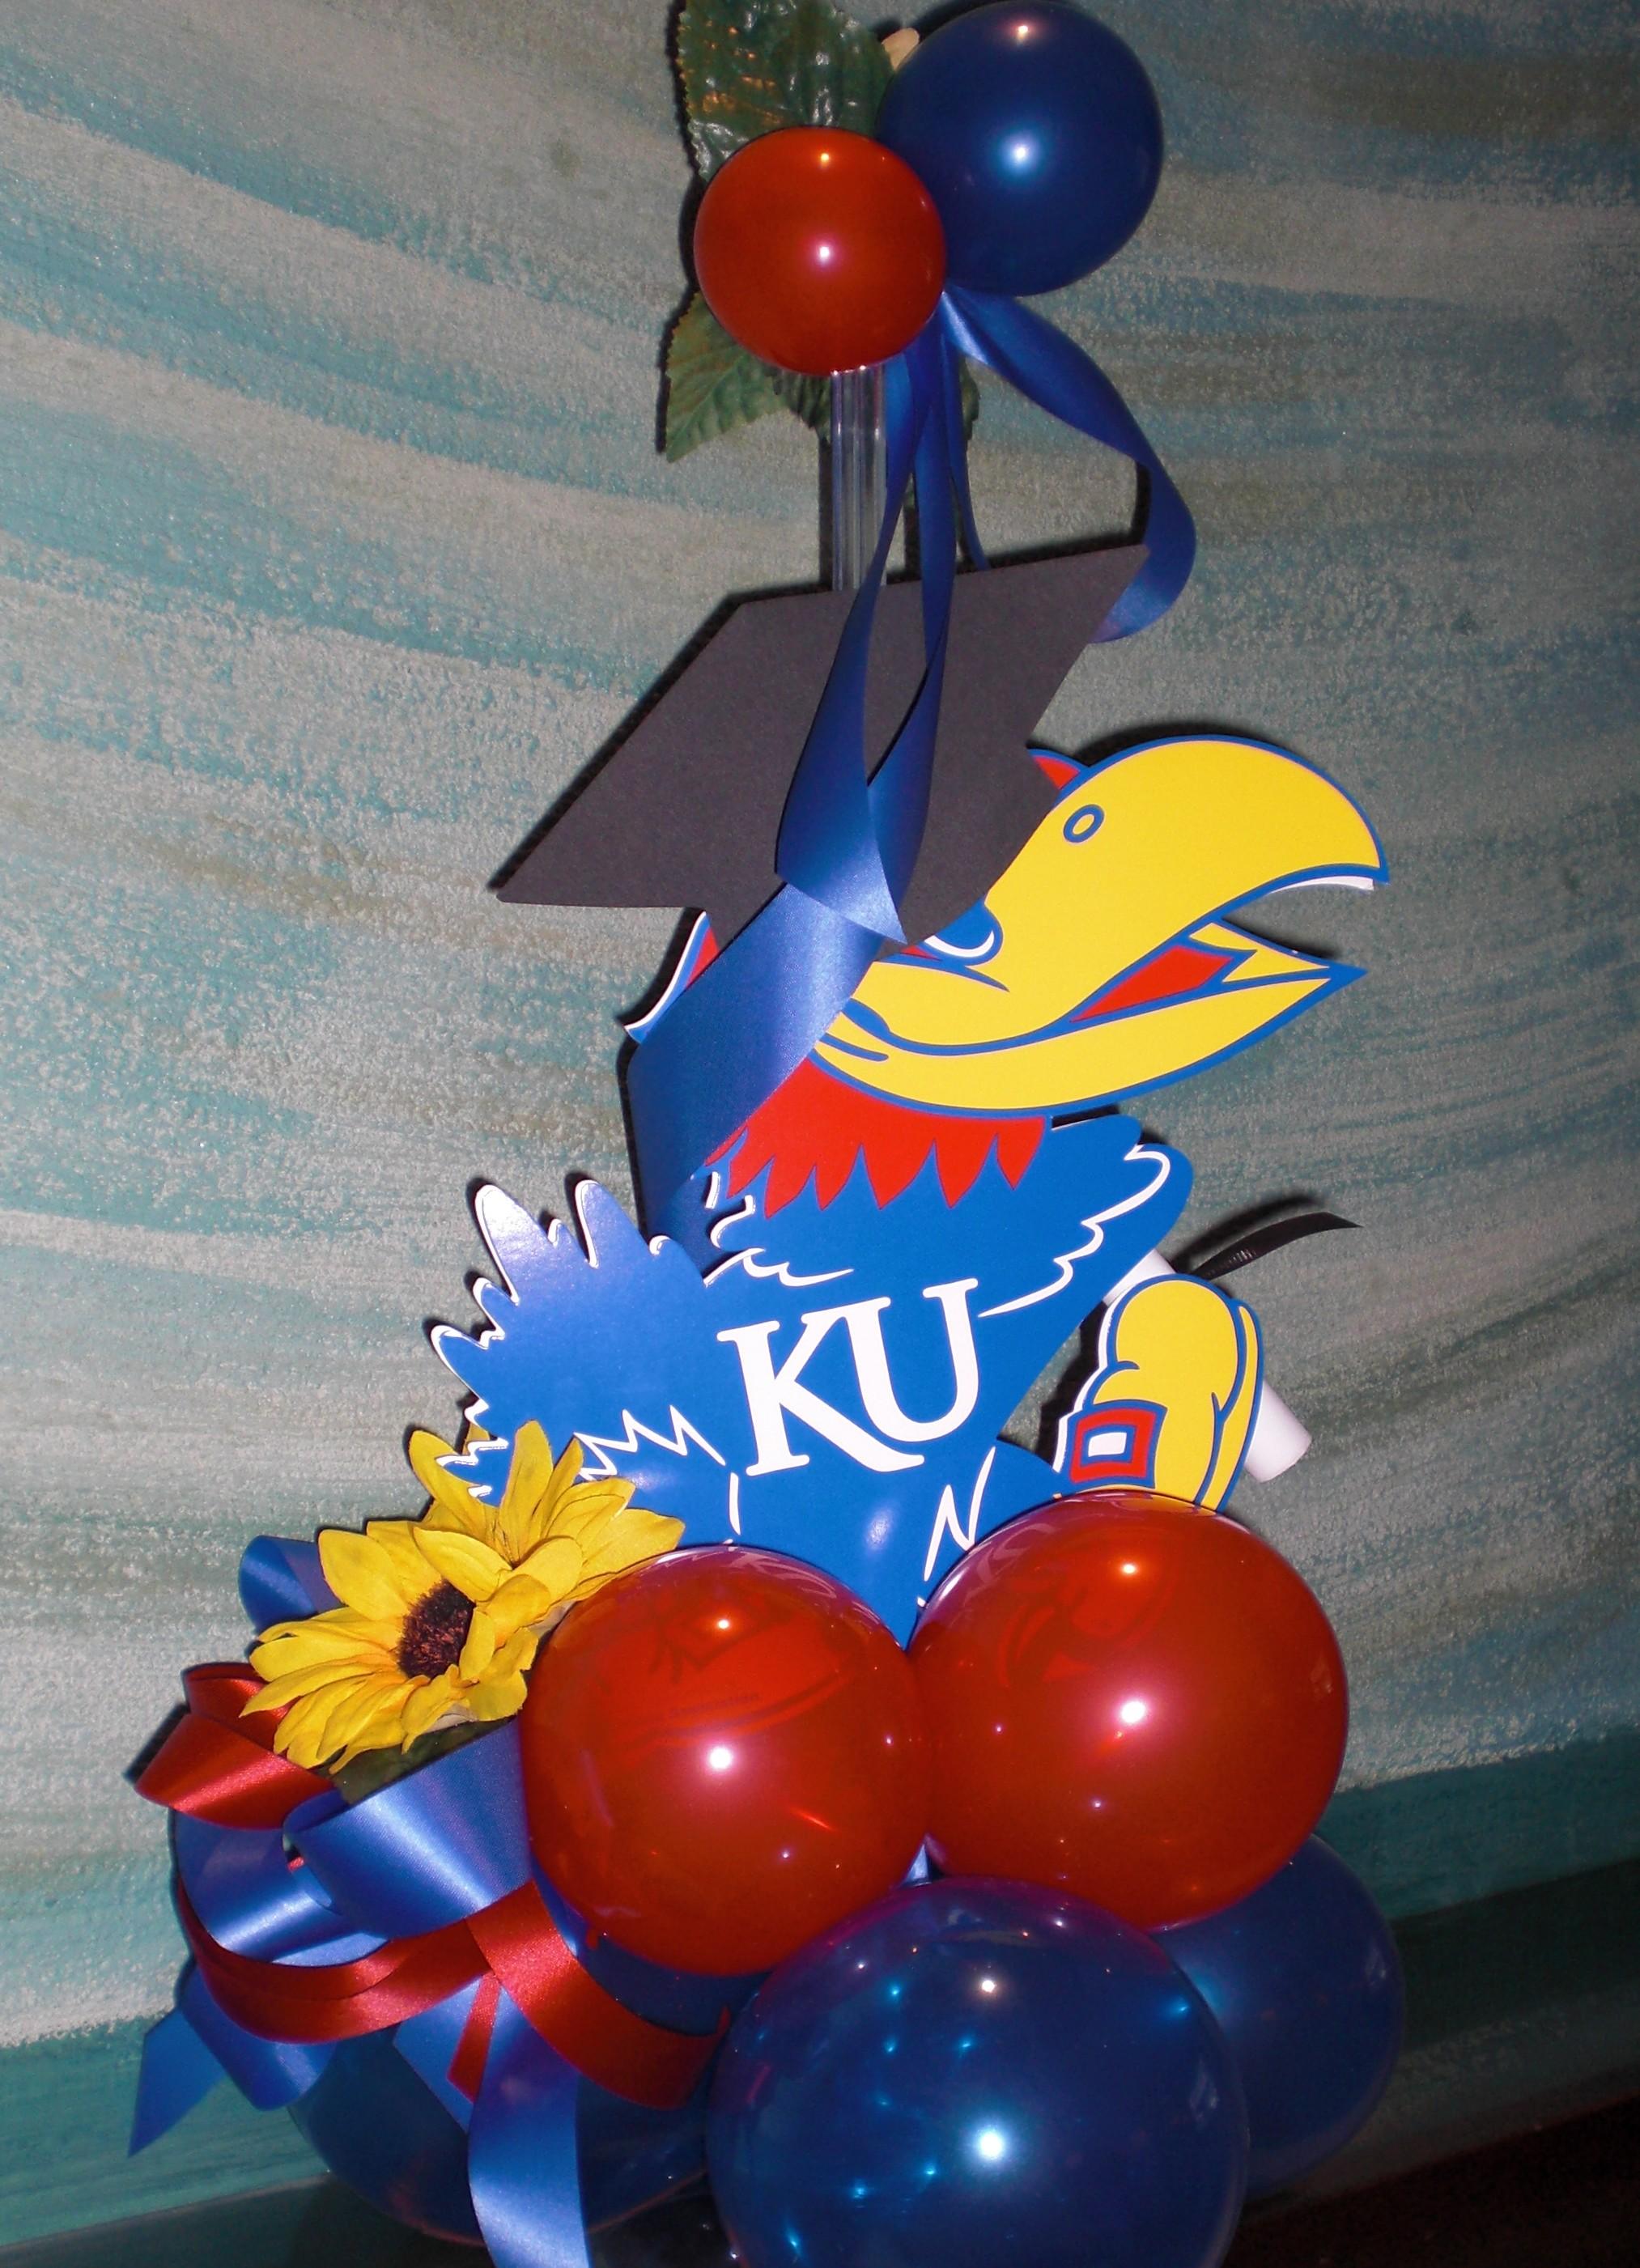 Balloons lawrence ks balloons kansas city balloons topeka ku balloon centerpieces